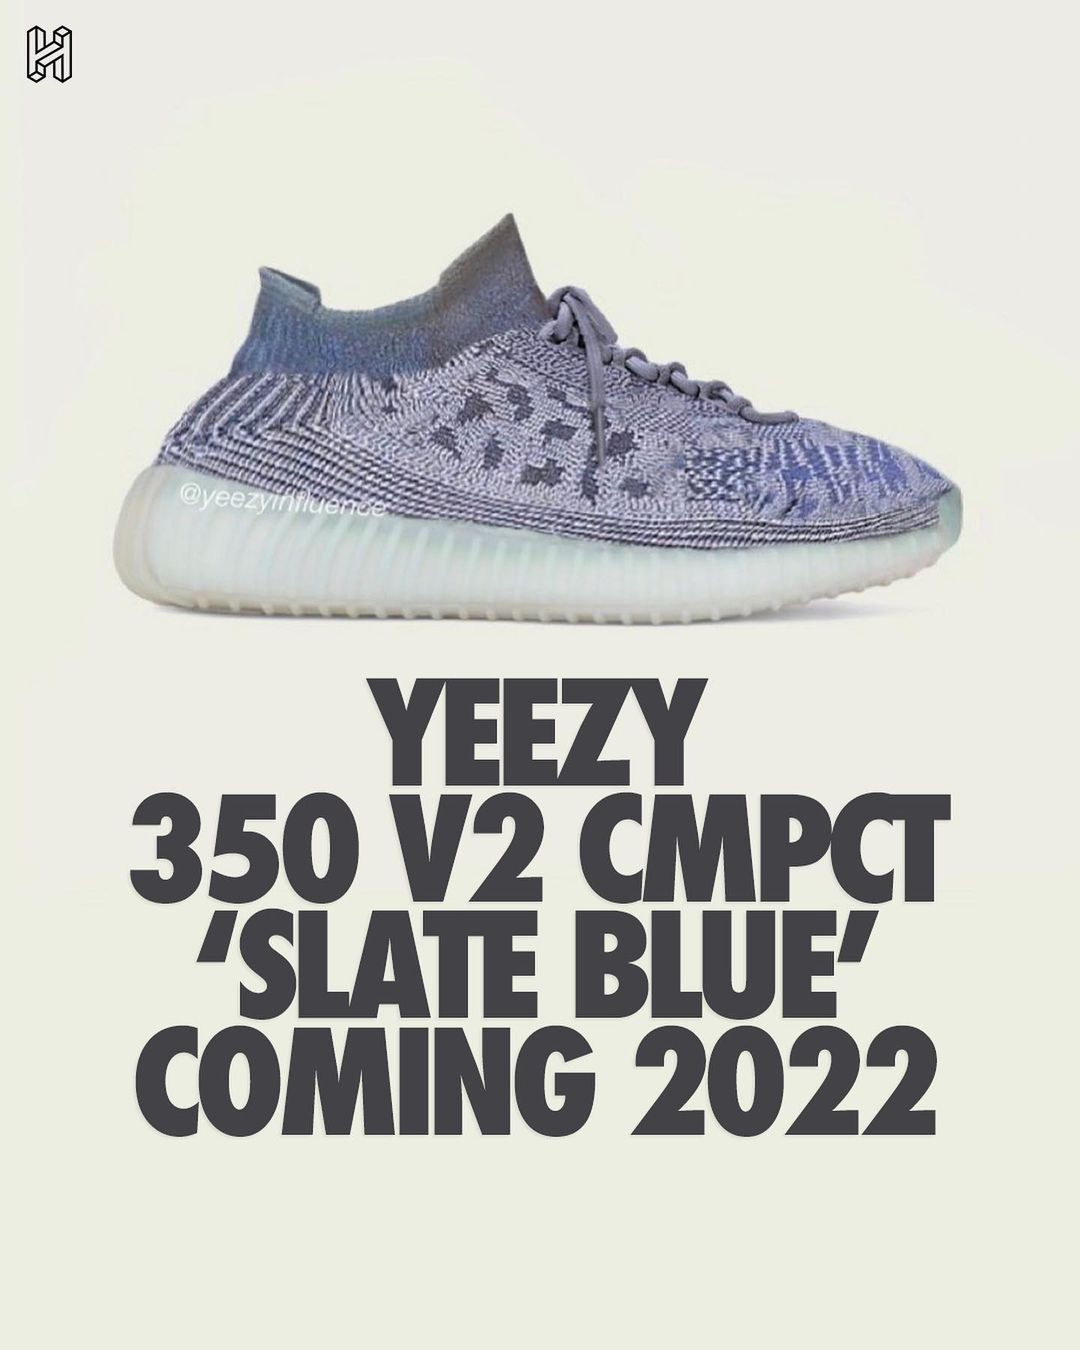 adidas,Yeezy Boost 350 V2 CMPC  全新版本 Yeezy 350 V2 首次曝光!年底发售!